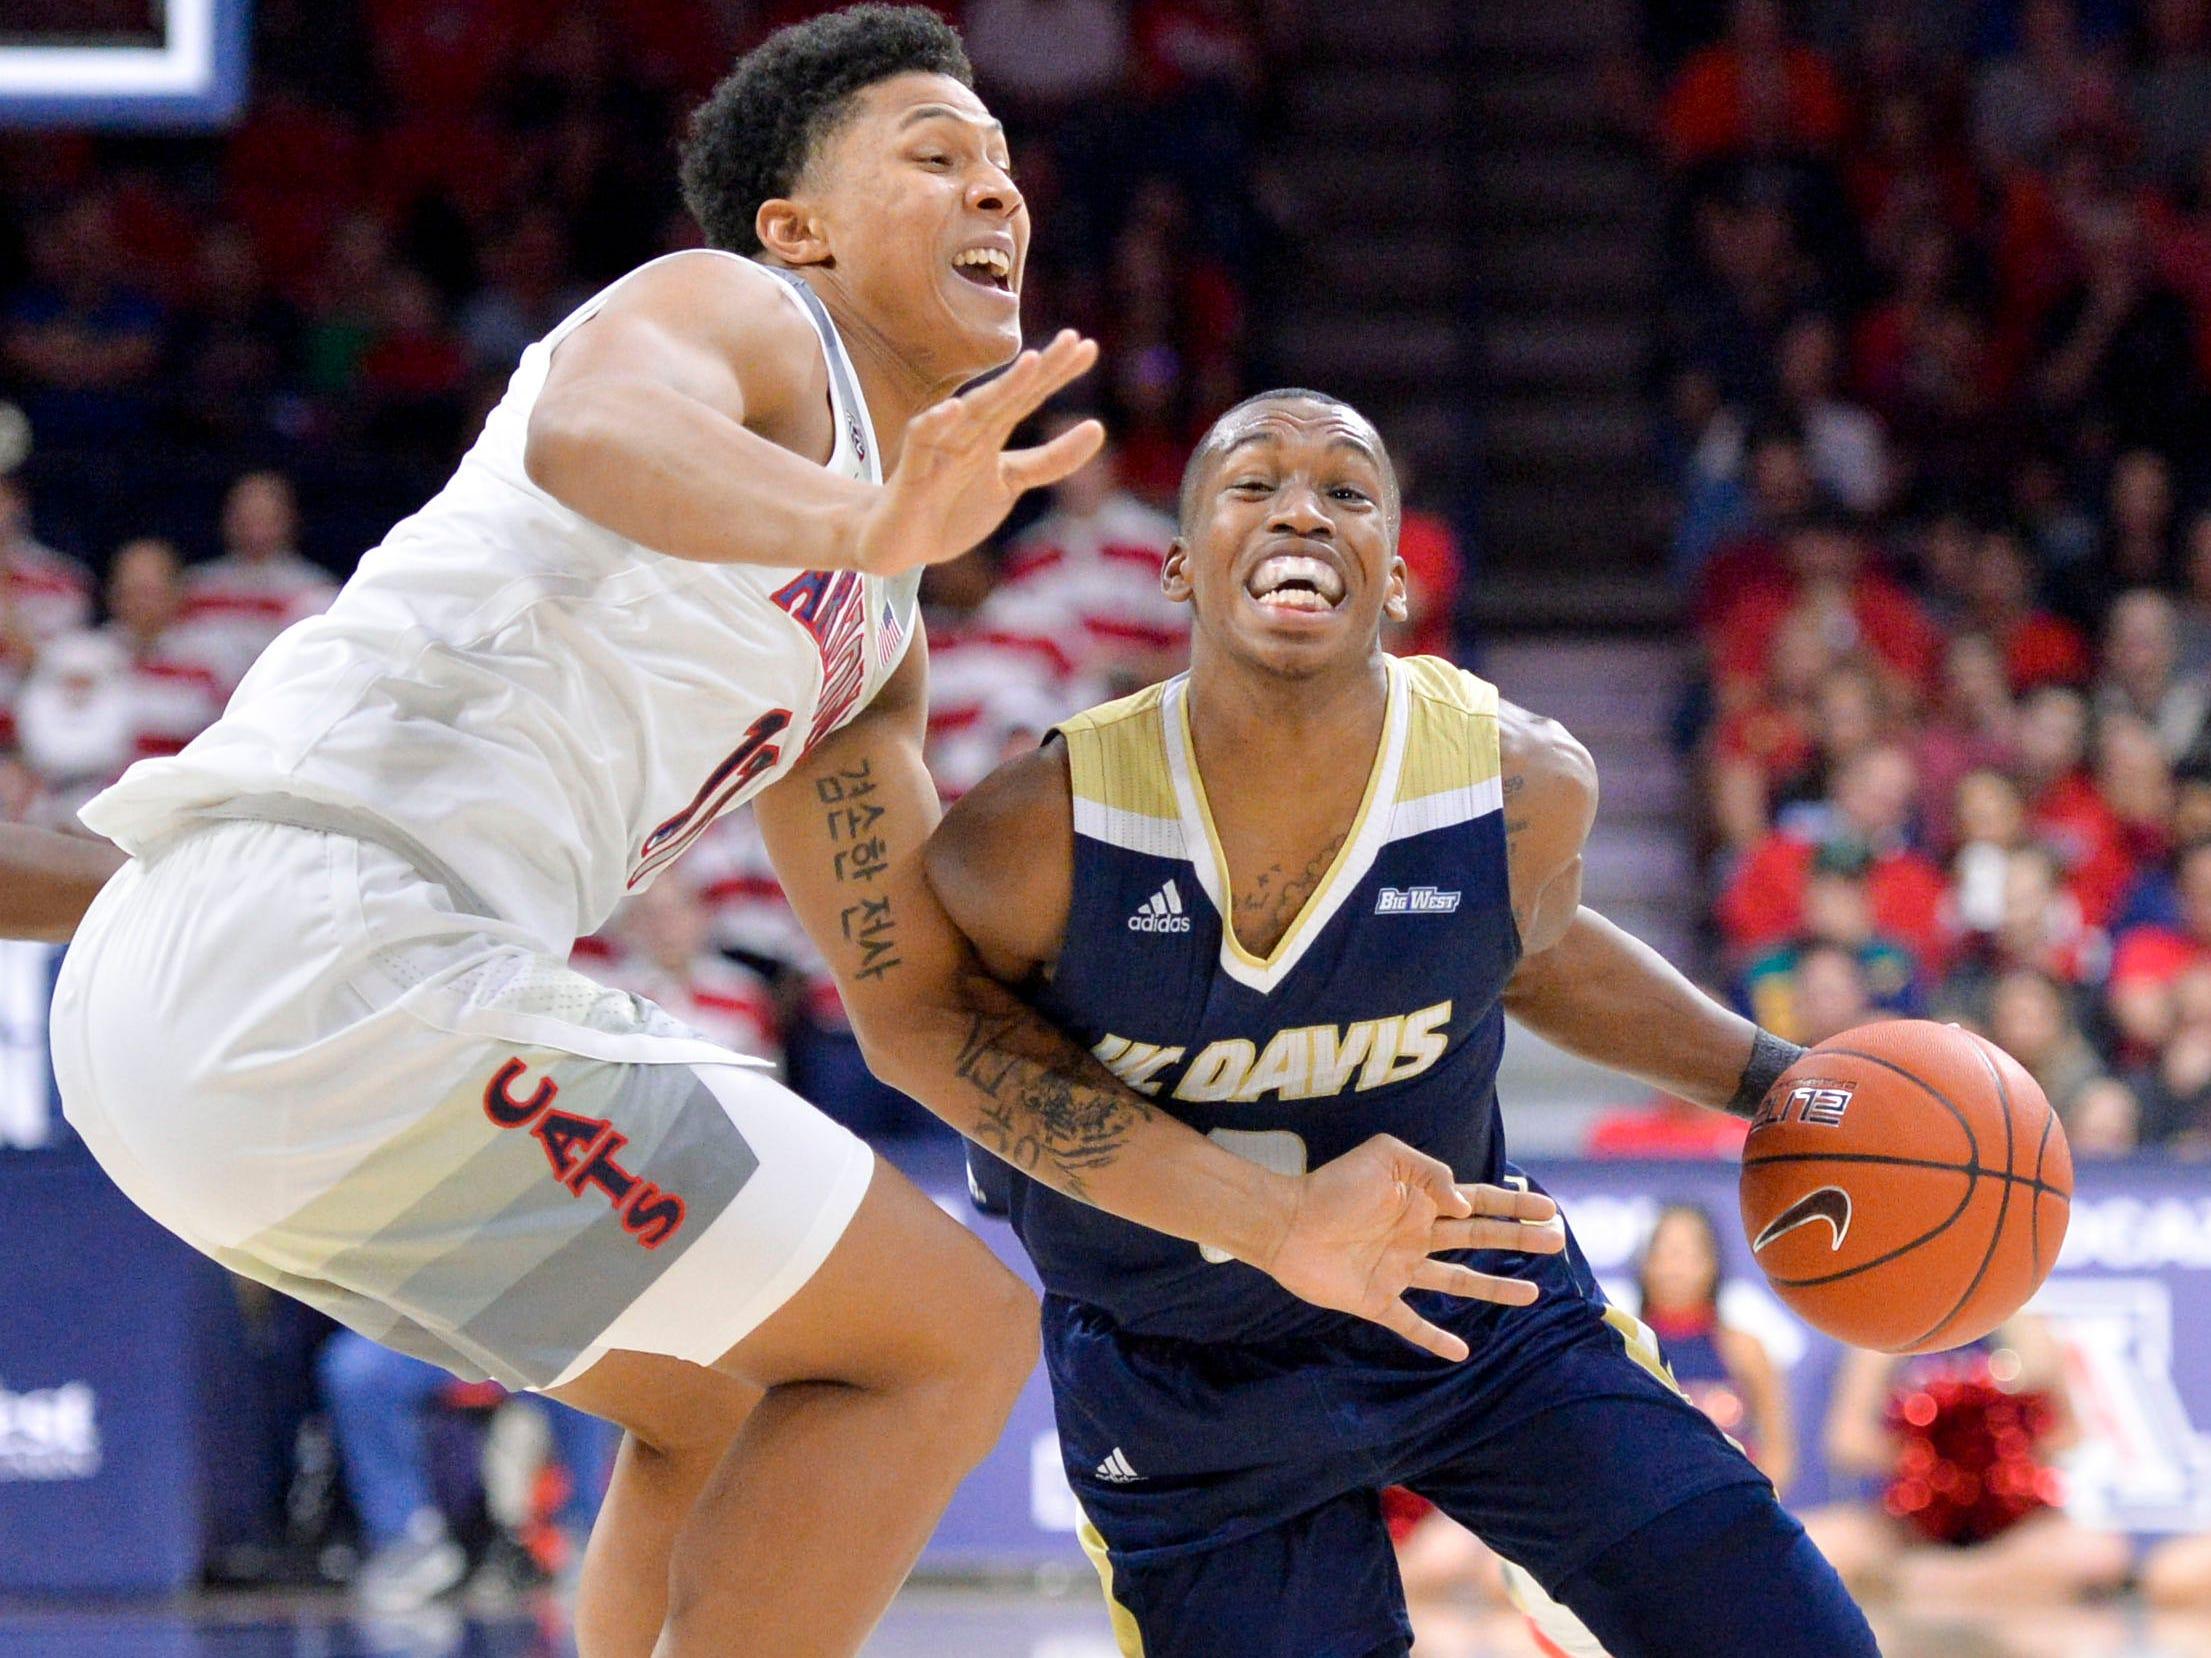 Dec 22, 2018; Tucson, AZ, USA; UC Davis Aggies guard TJ Shorts II (0) drives to the basket as Arizona Wildcats forward Ira Lee (11) defends during the first half at McKale Center. Mandatory Credit: Casey Sapio-USA TODAY Sports